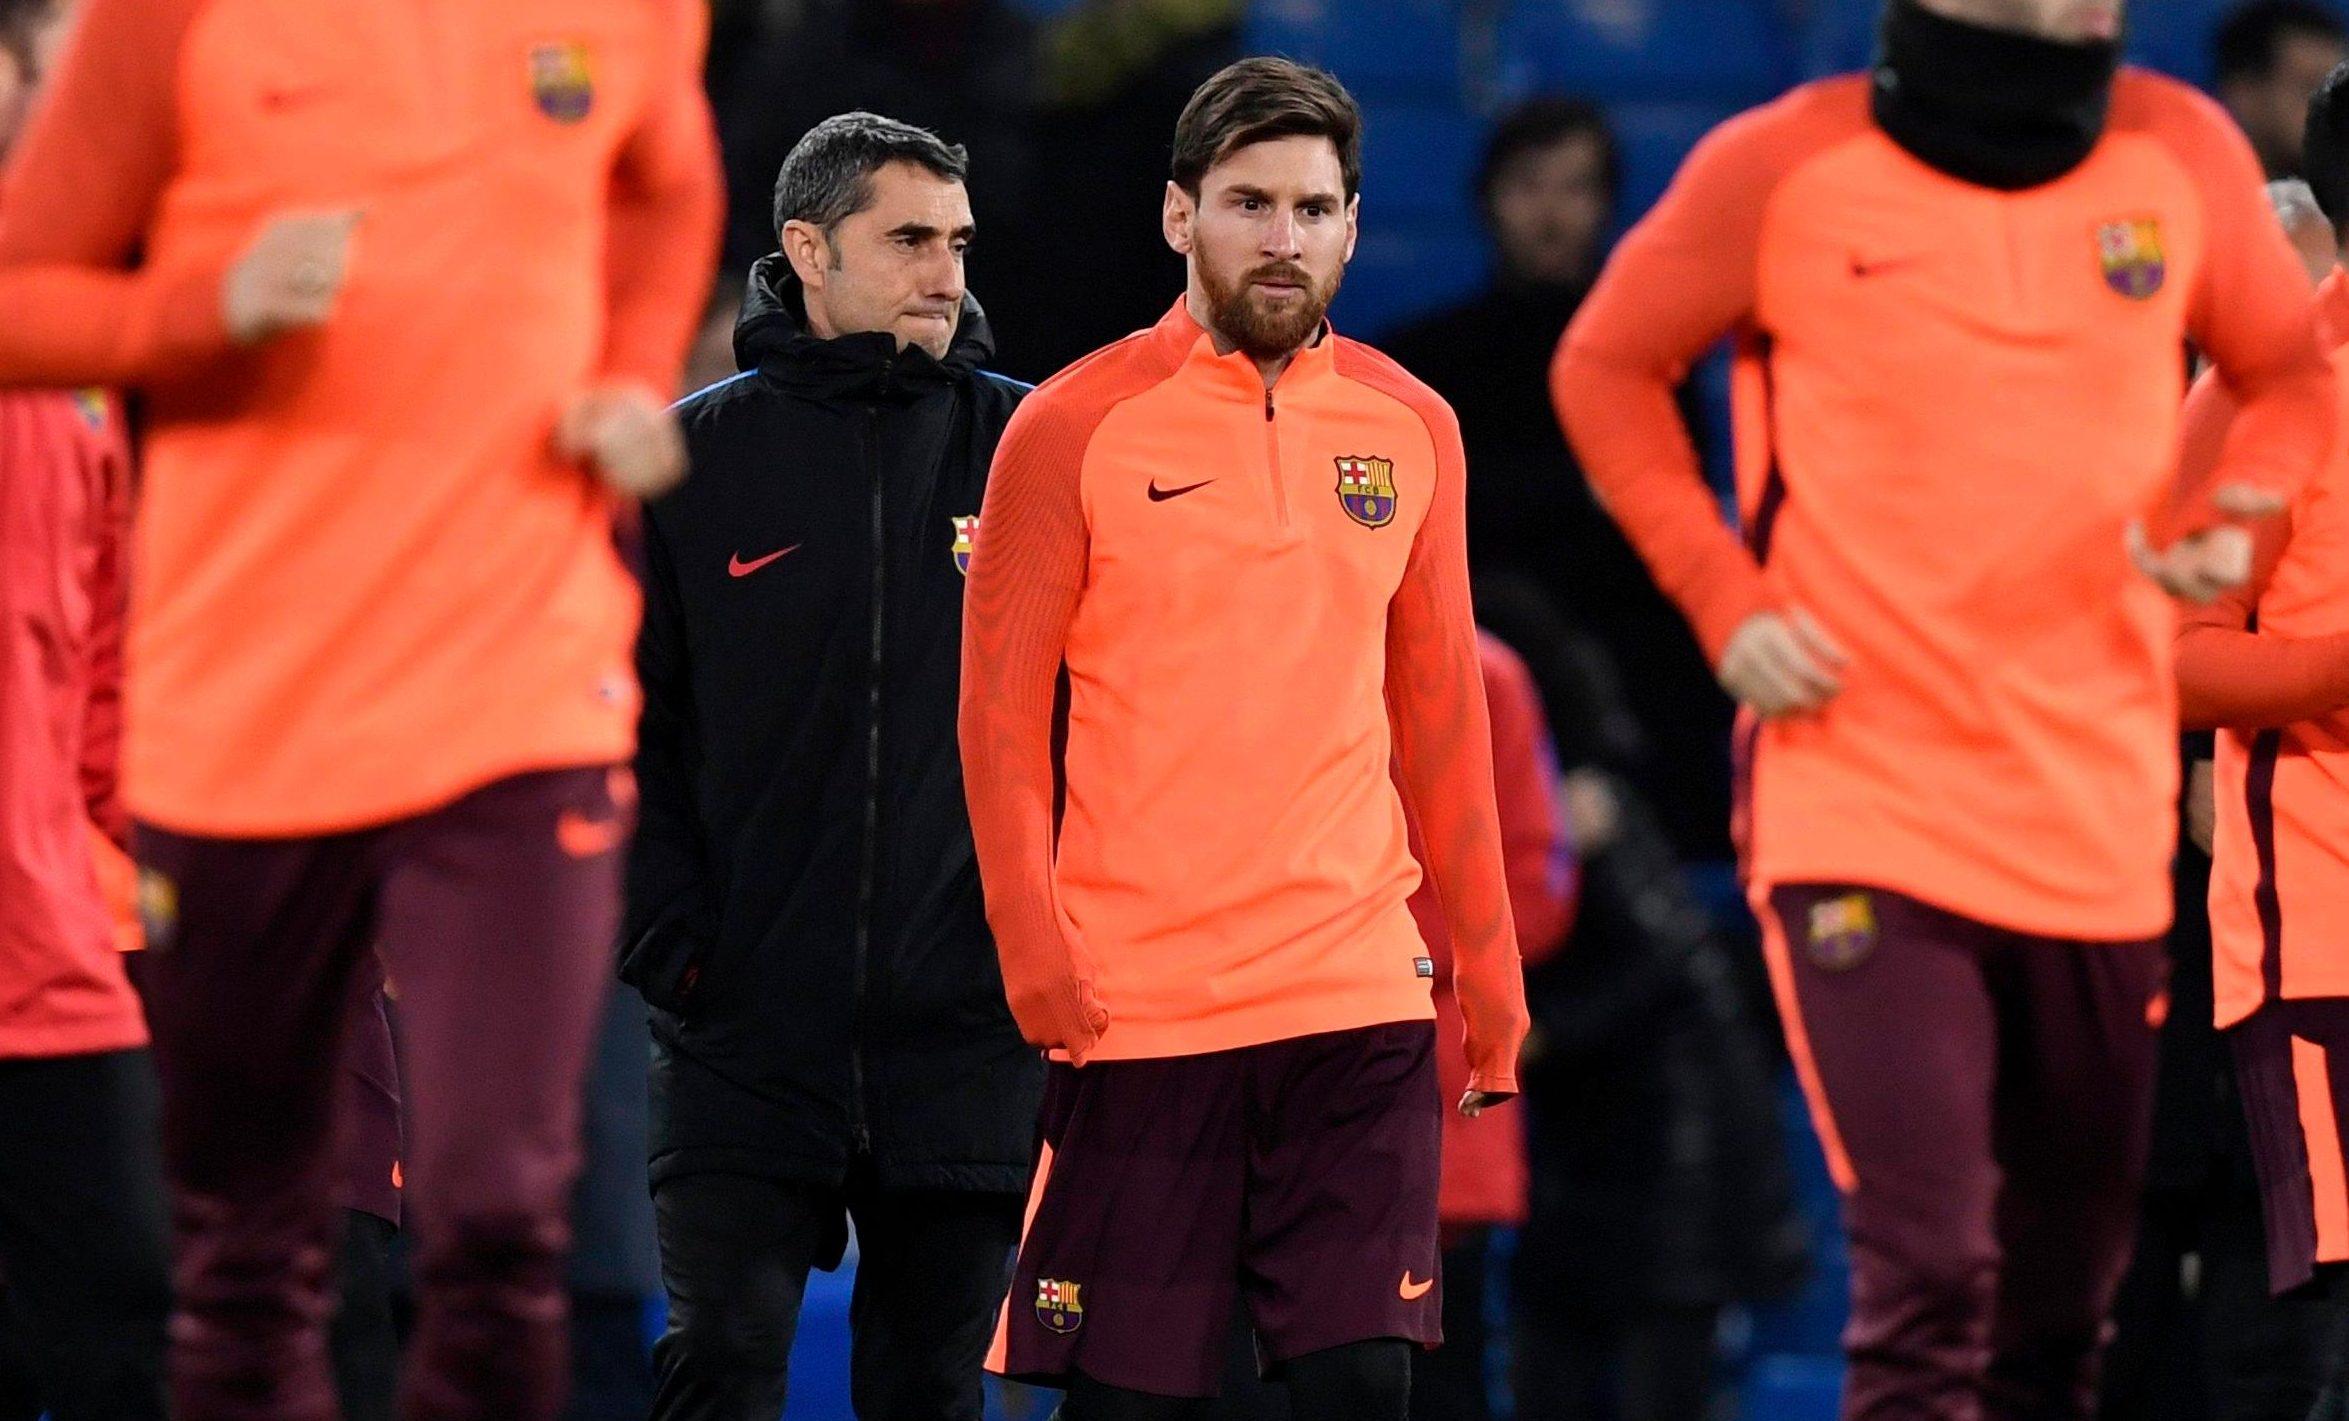 Valverde has drawn Messi further back this season